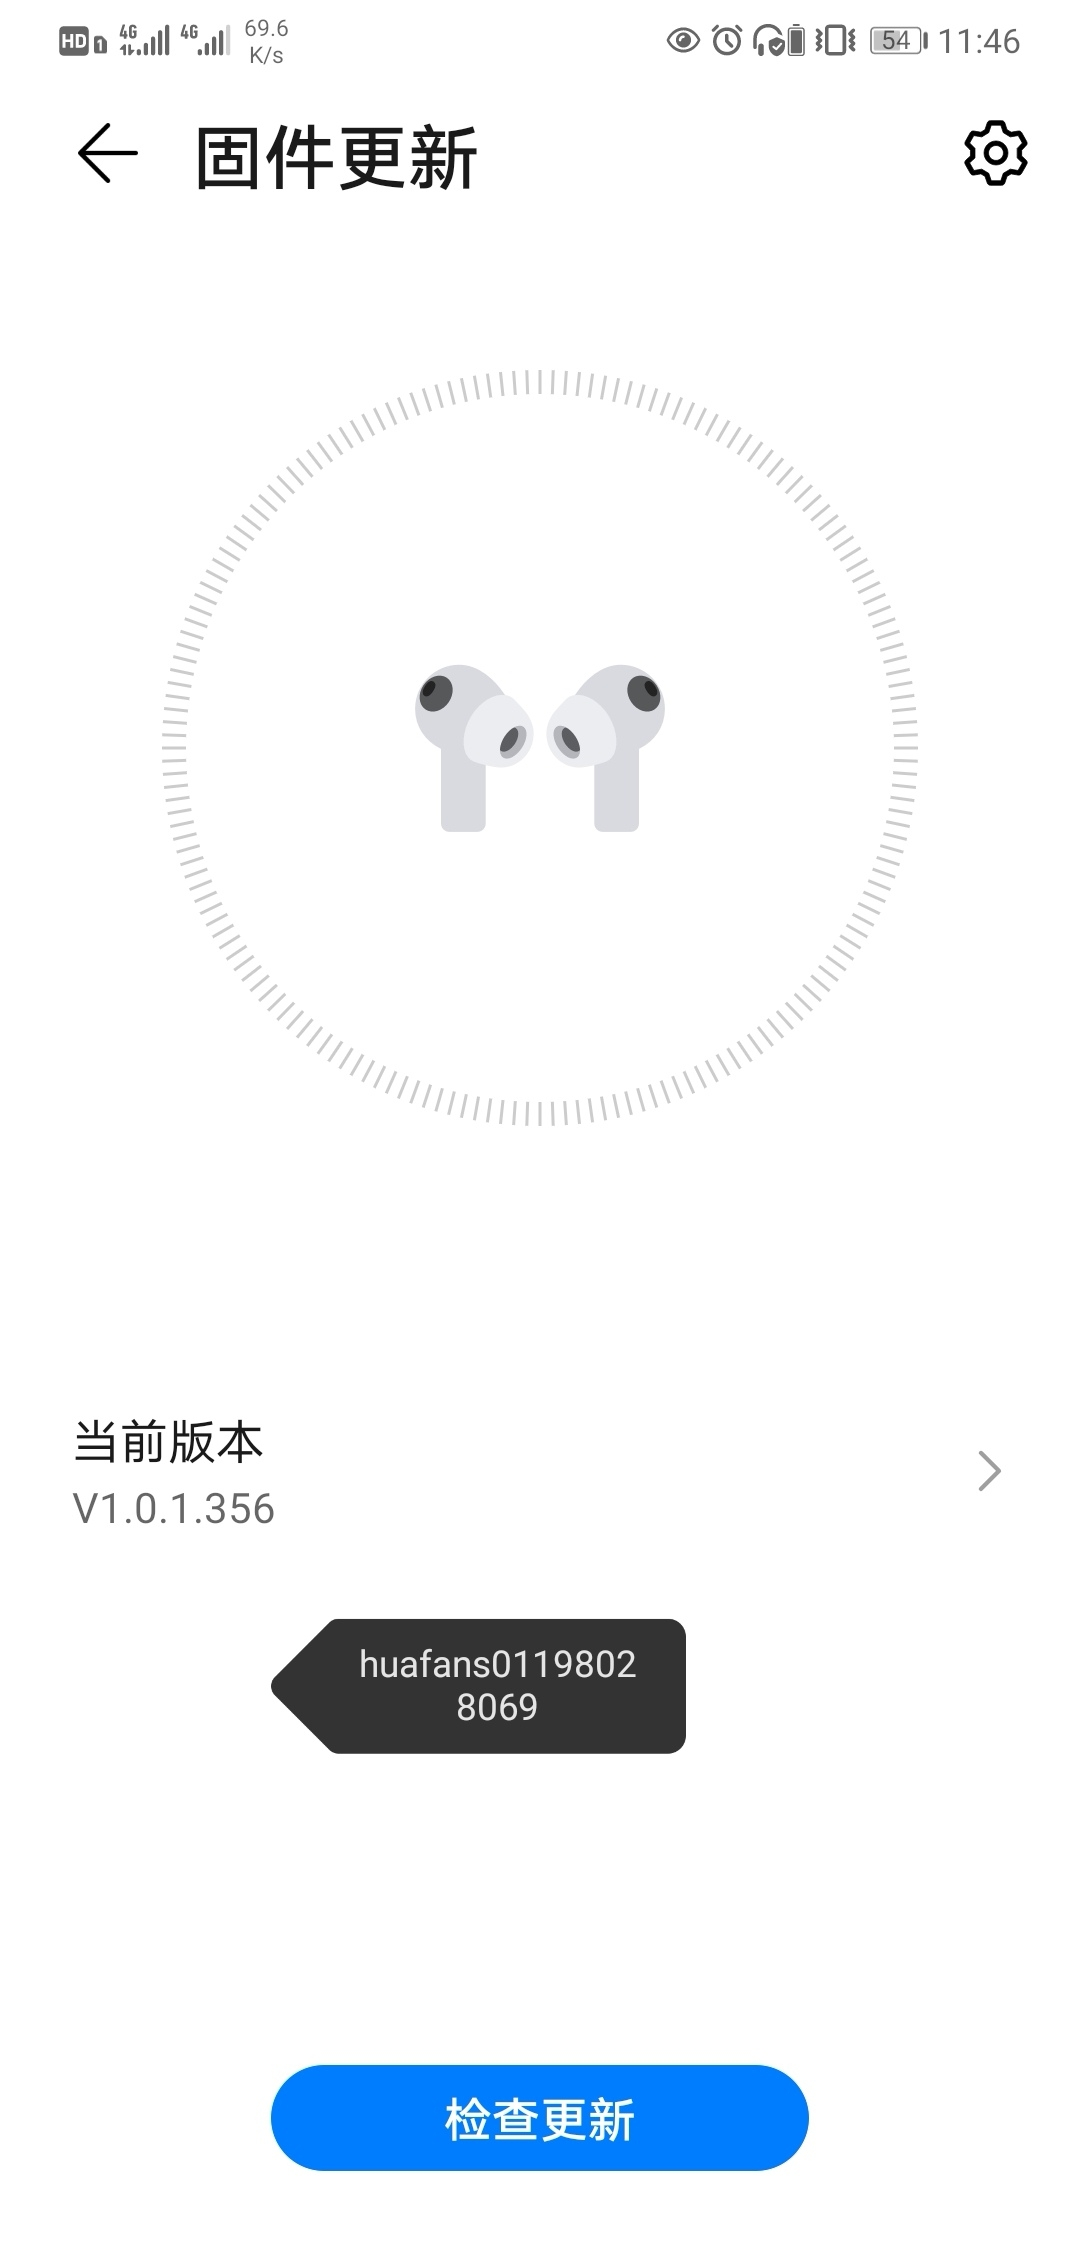 Screenshot_20210419_114640_com.huawei.smarthome_edit_34539355152541.jpg